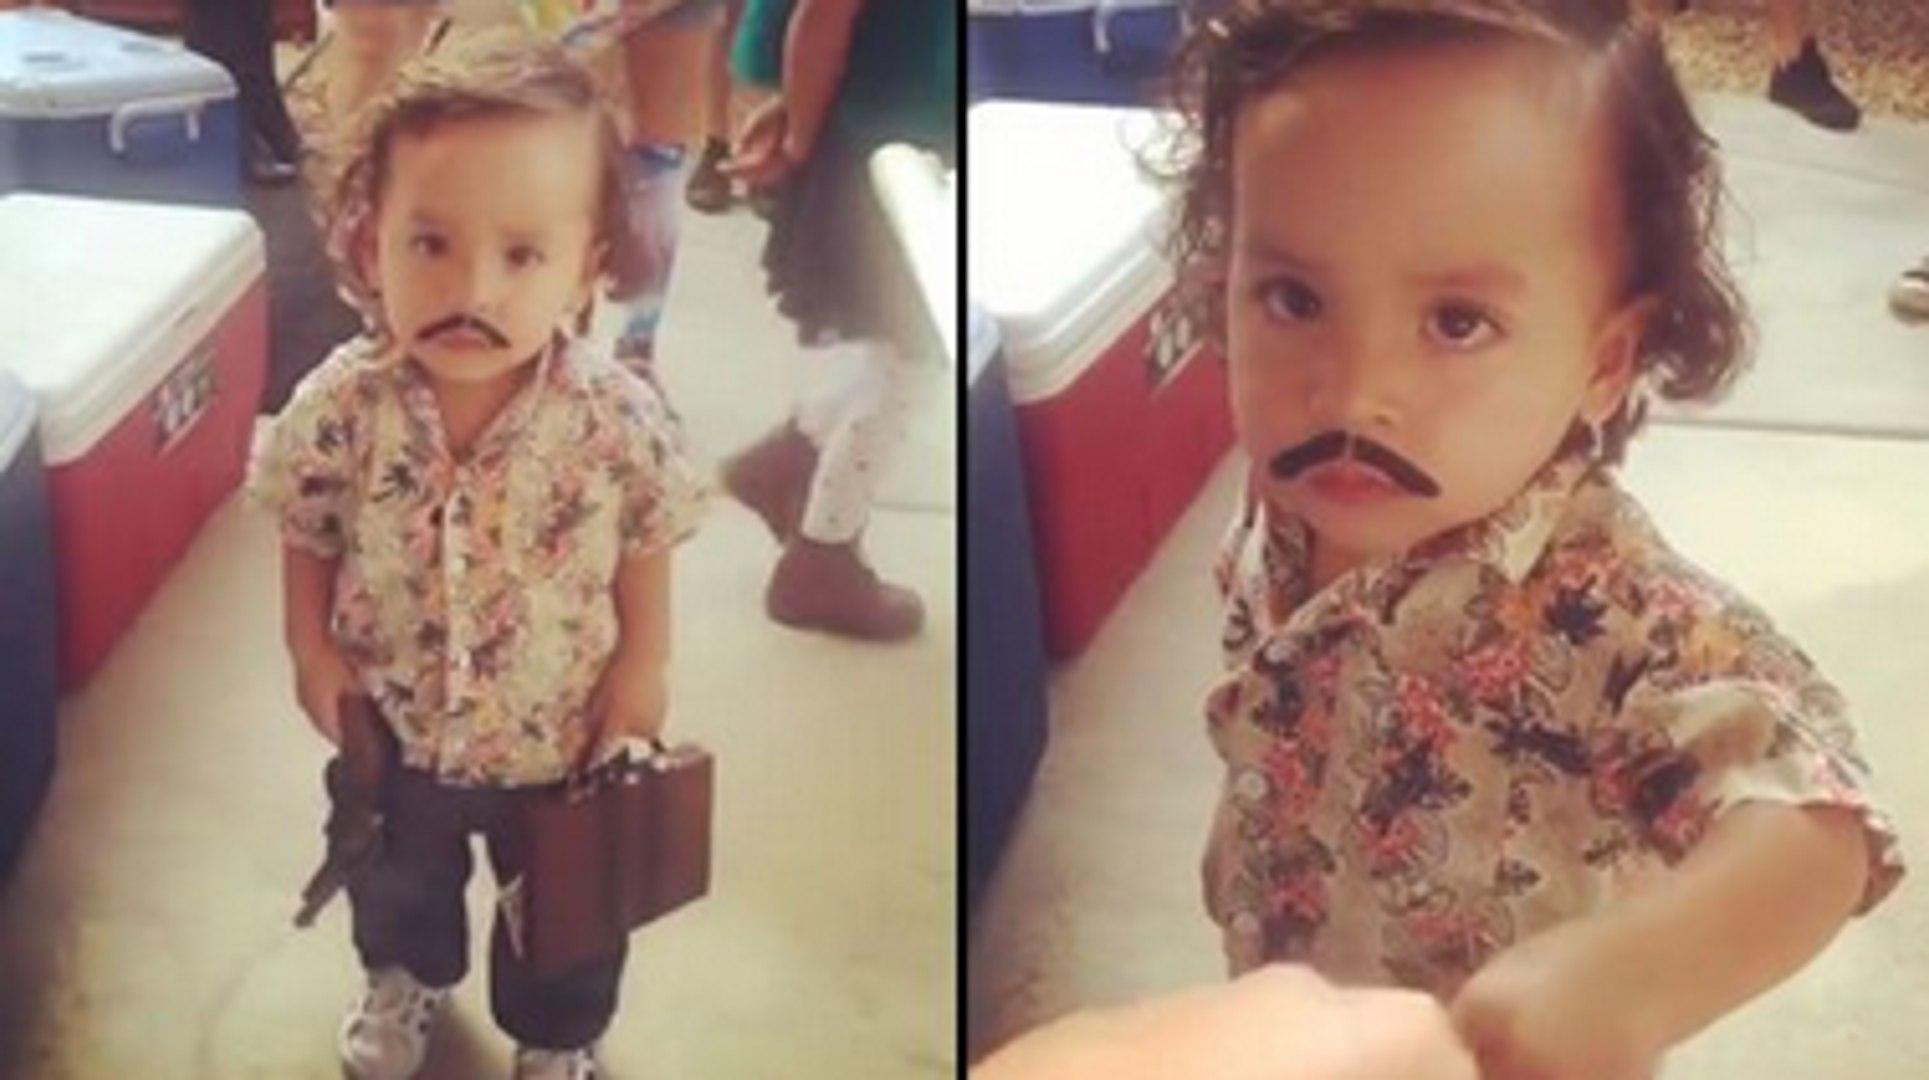 Little Pablo Escobar Runs The Biggest Fun Size Snickers Cartel